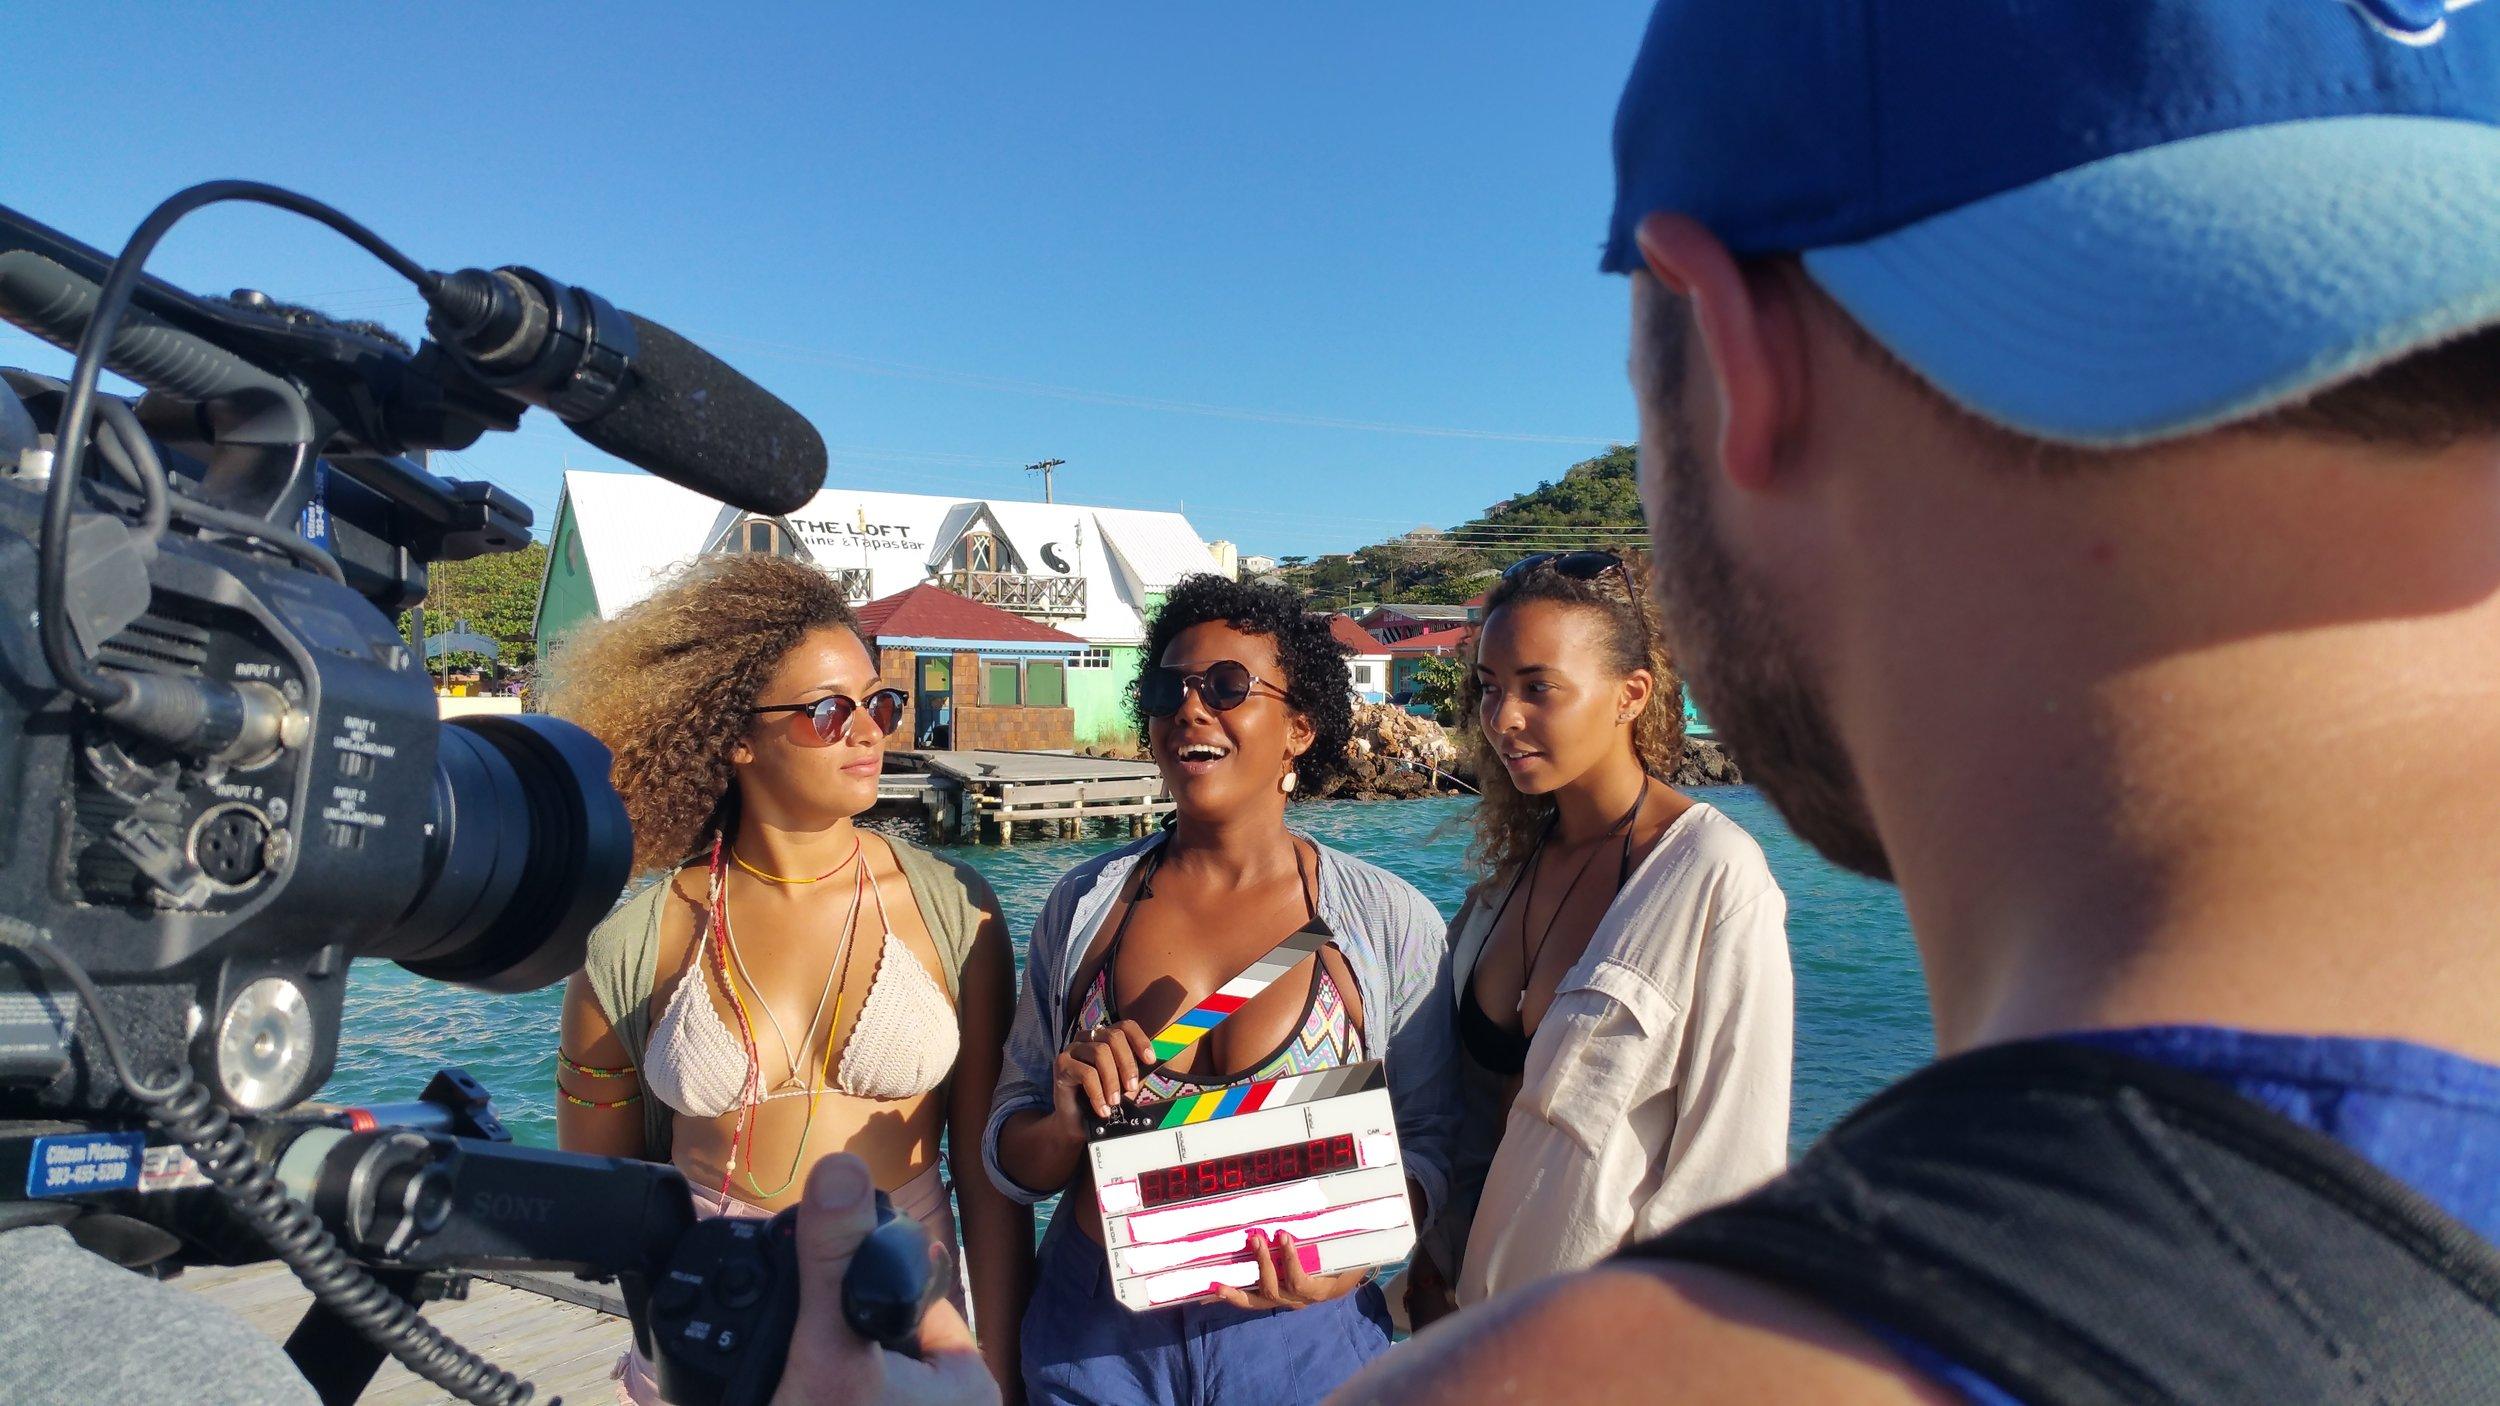 Union Island - Getting Ready to Head onto the 40 foot Speed Boat - Mia, Ariel and Tatiana